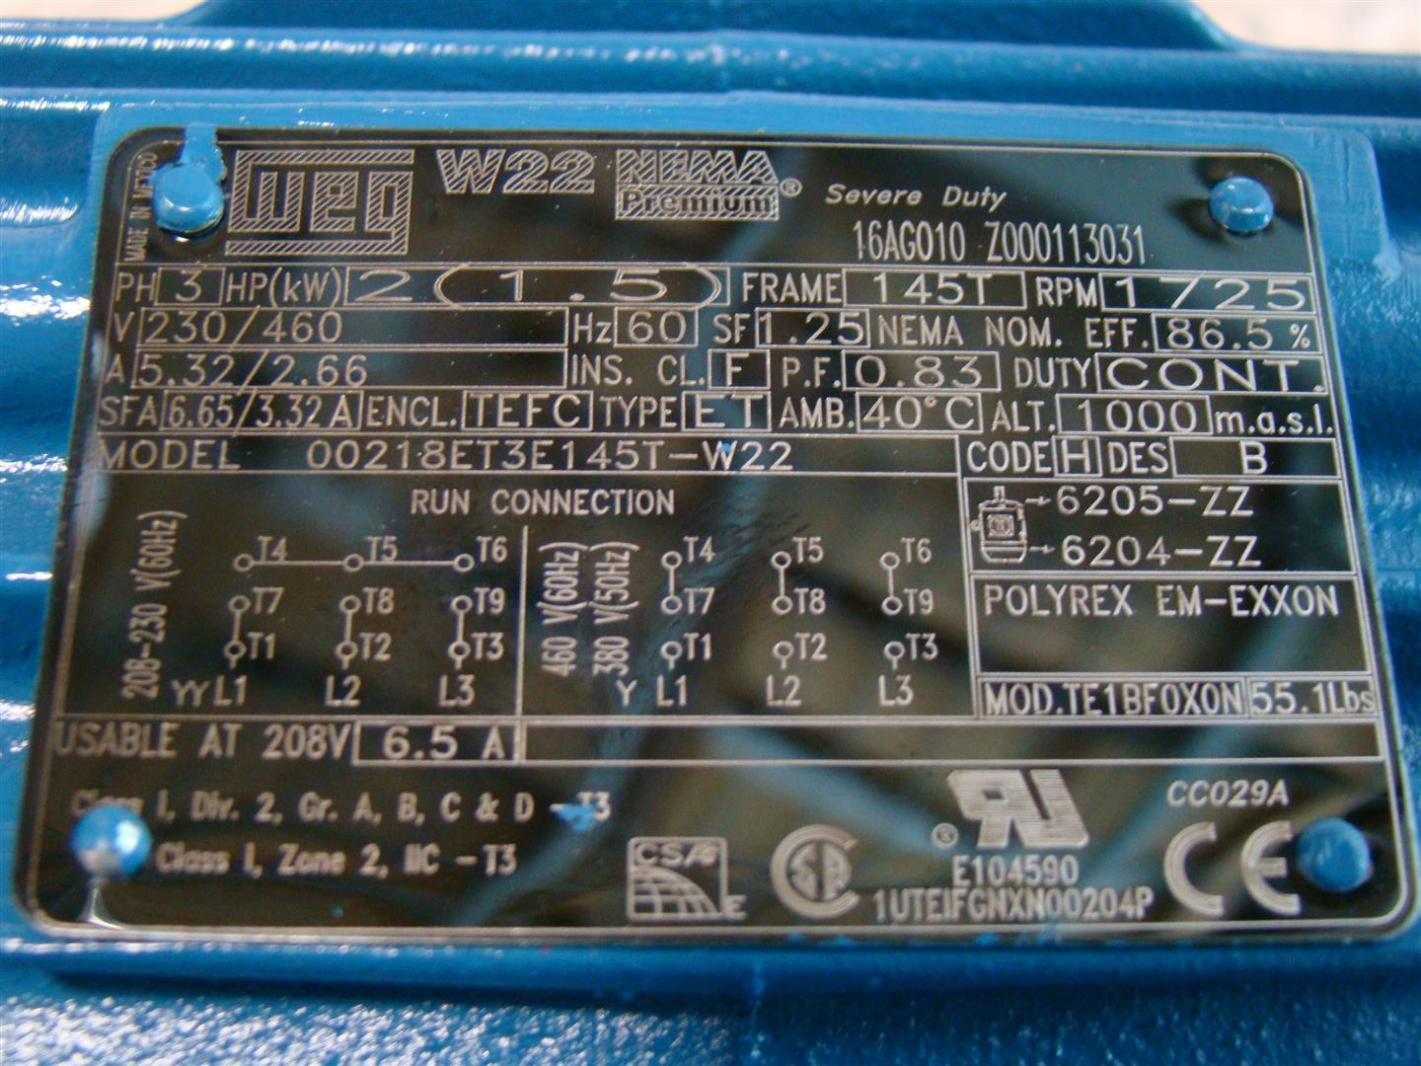 ahw110 weg w22 premium 2hp motor 230 460v 1725rpm 00218et3e145t w22 2 weg w22 motor wiring diagram ewiring weg w22 motor wiring diagram at creativeand.co